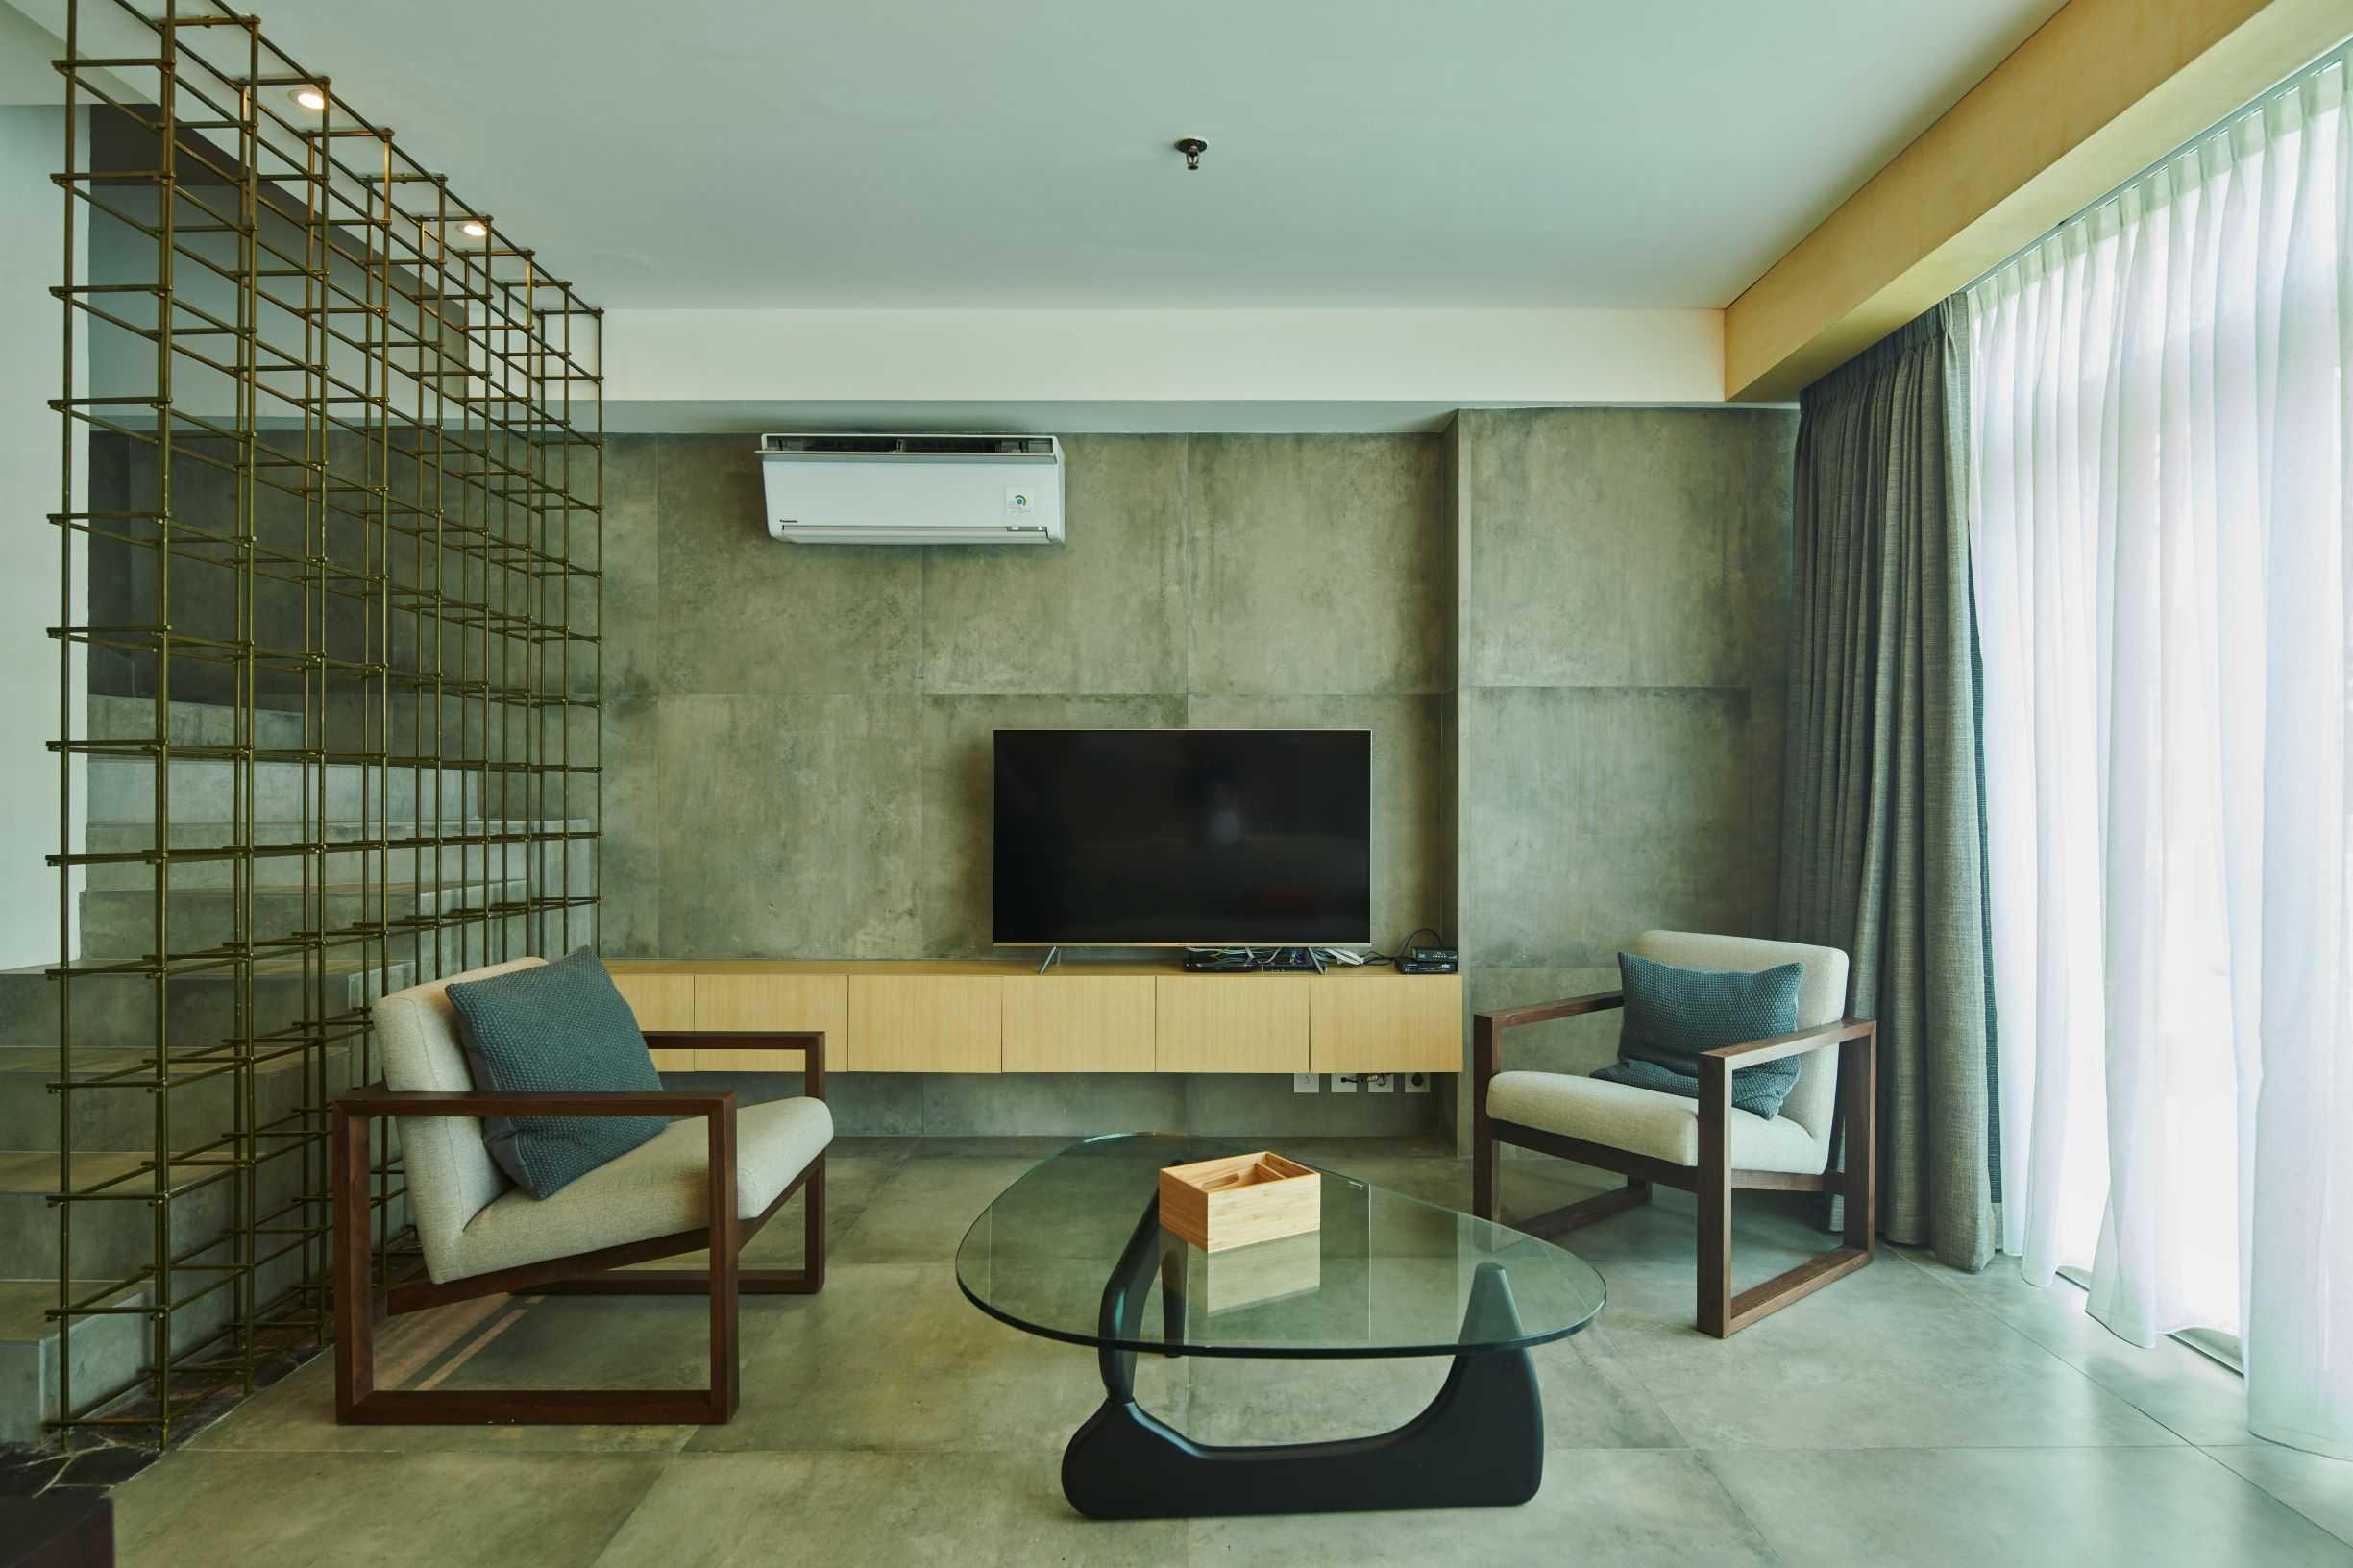 Hadivincent Architects Tb Apartment Lippo Cikarang, Bekasi, Jawa Barat, Indonesia Lippo Cikarang, Bekasi, Jawa Barat, Indonesia Hadi-Vincent-Architects-Tb-Apartment   70997